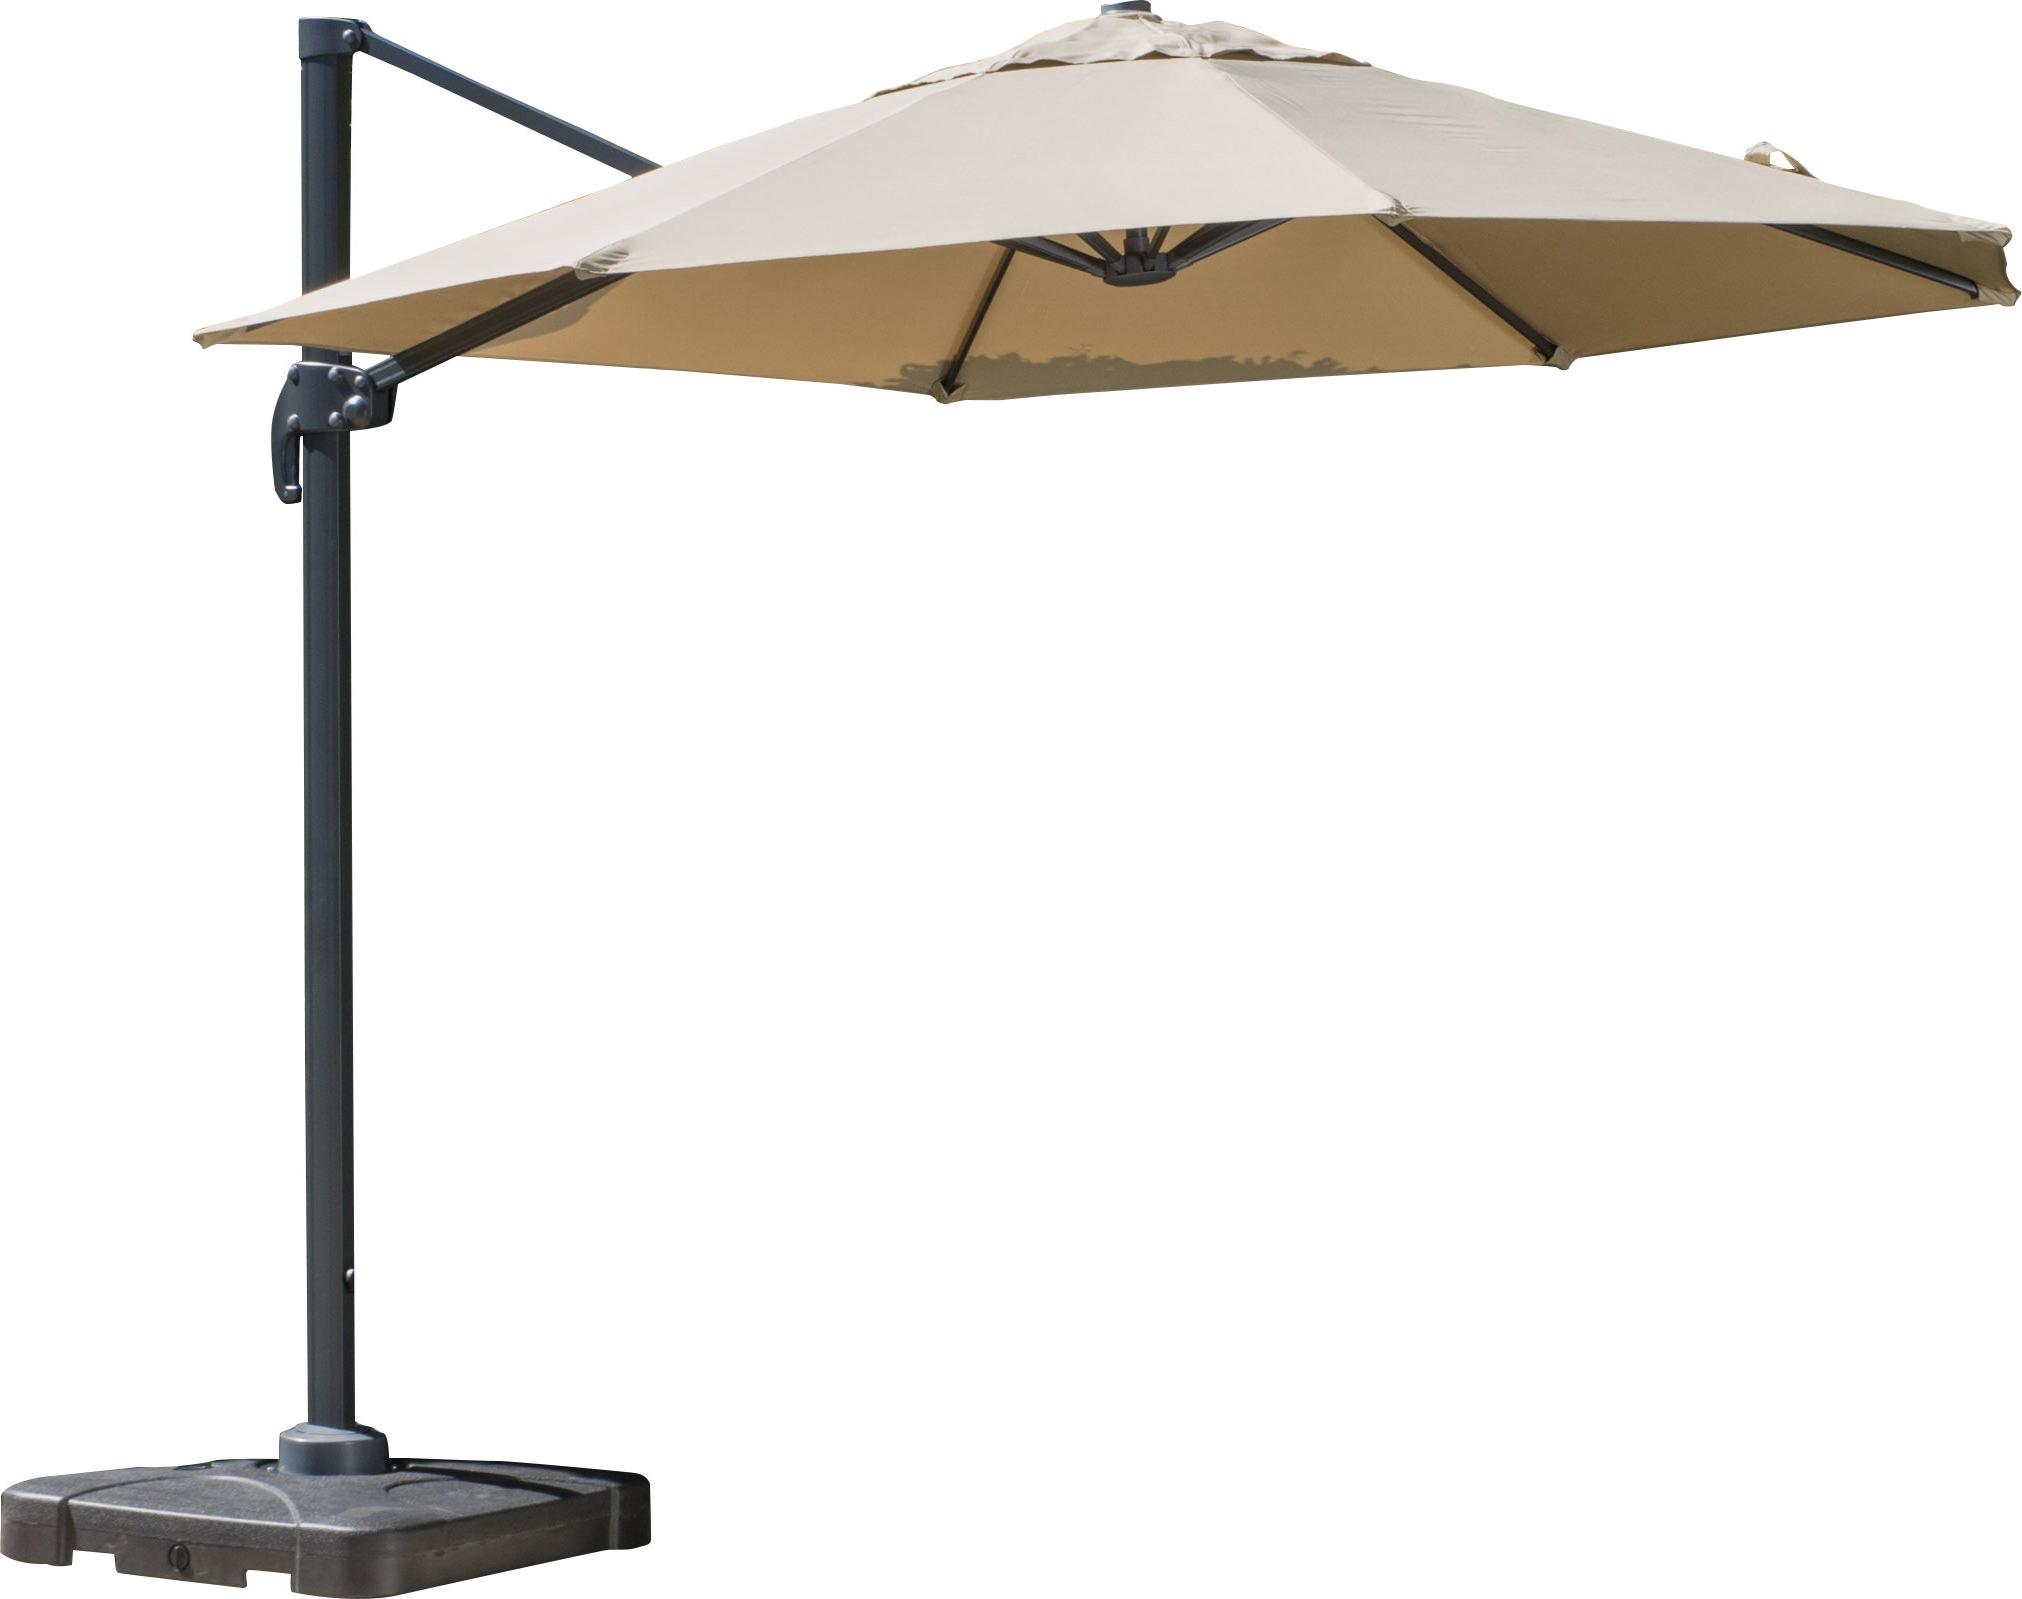 Bellana Cantilever Umbrella With 2020 Freda Cantilever Umbrellas (Gallery 7 of 20)